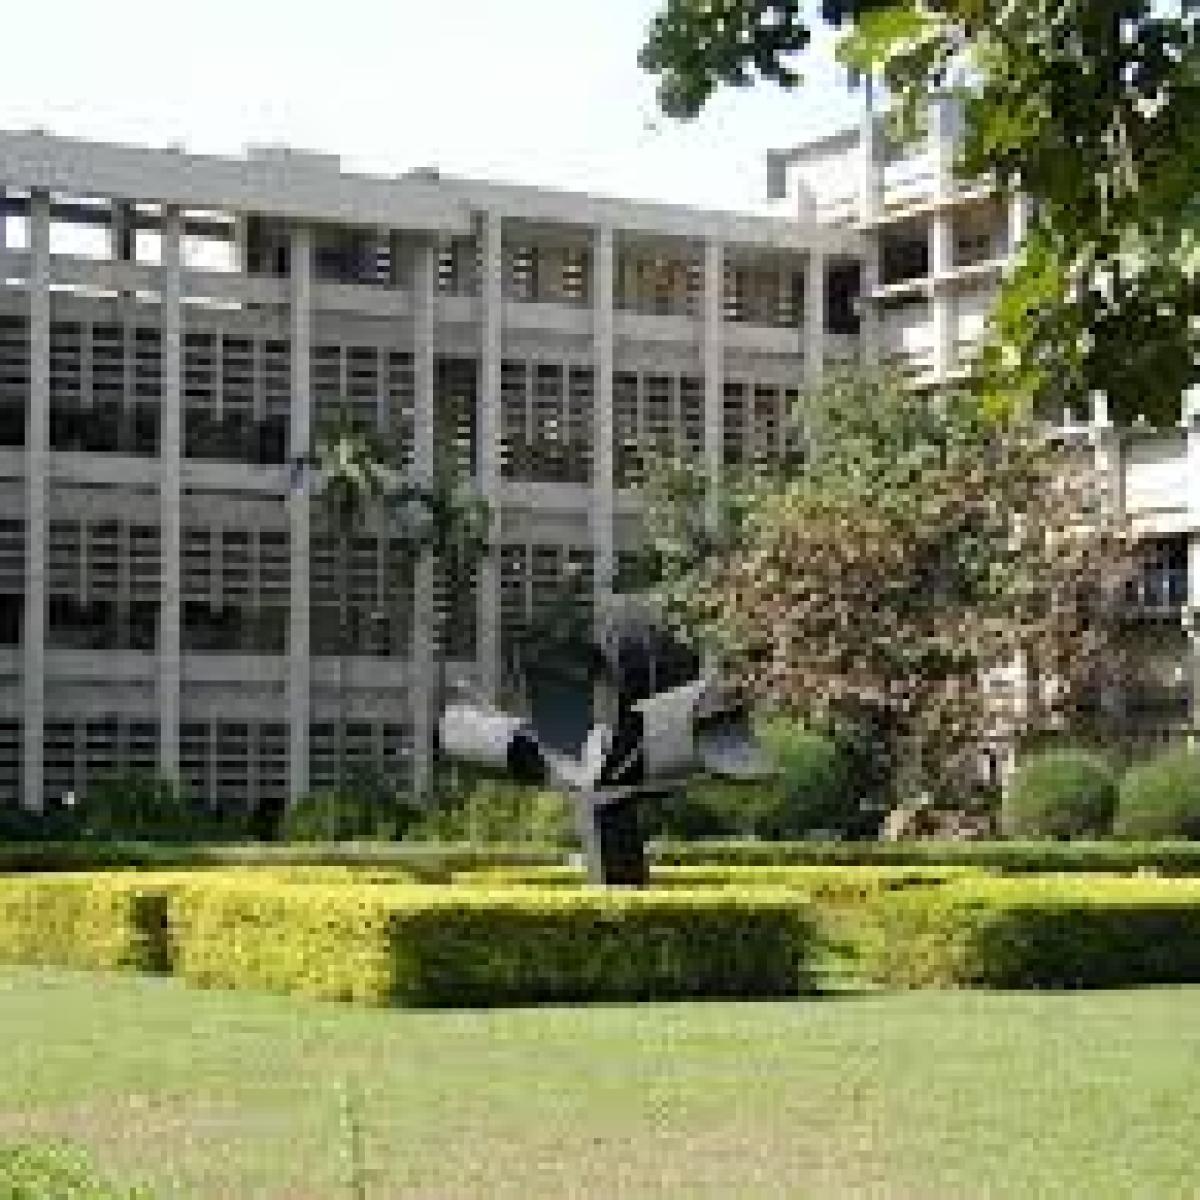 Latest Coronavirus Update in India: IIT-Bombay students told to go home